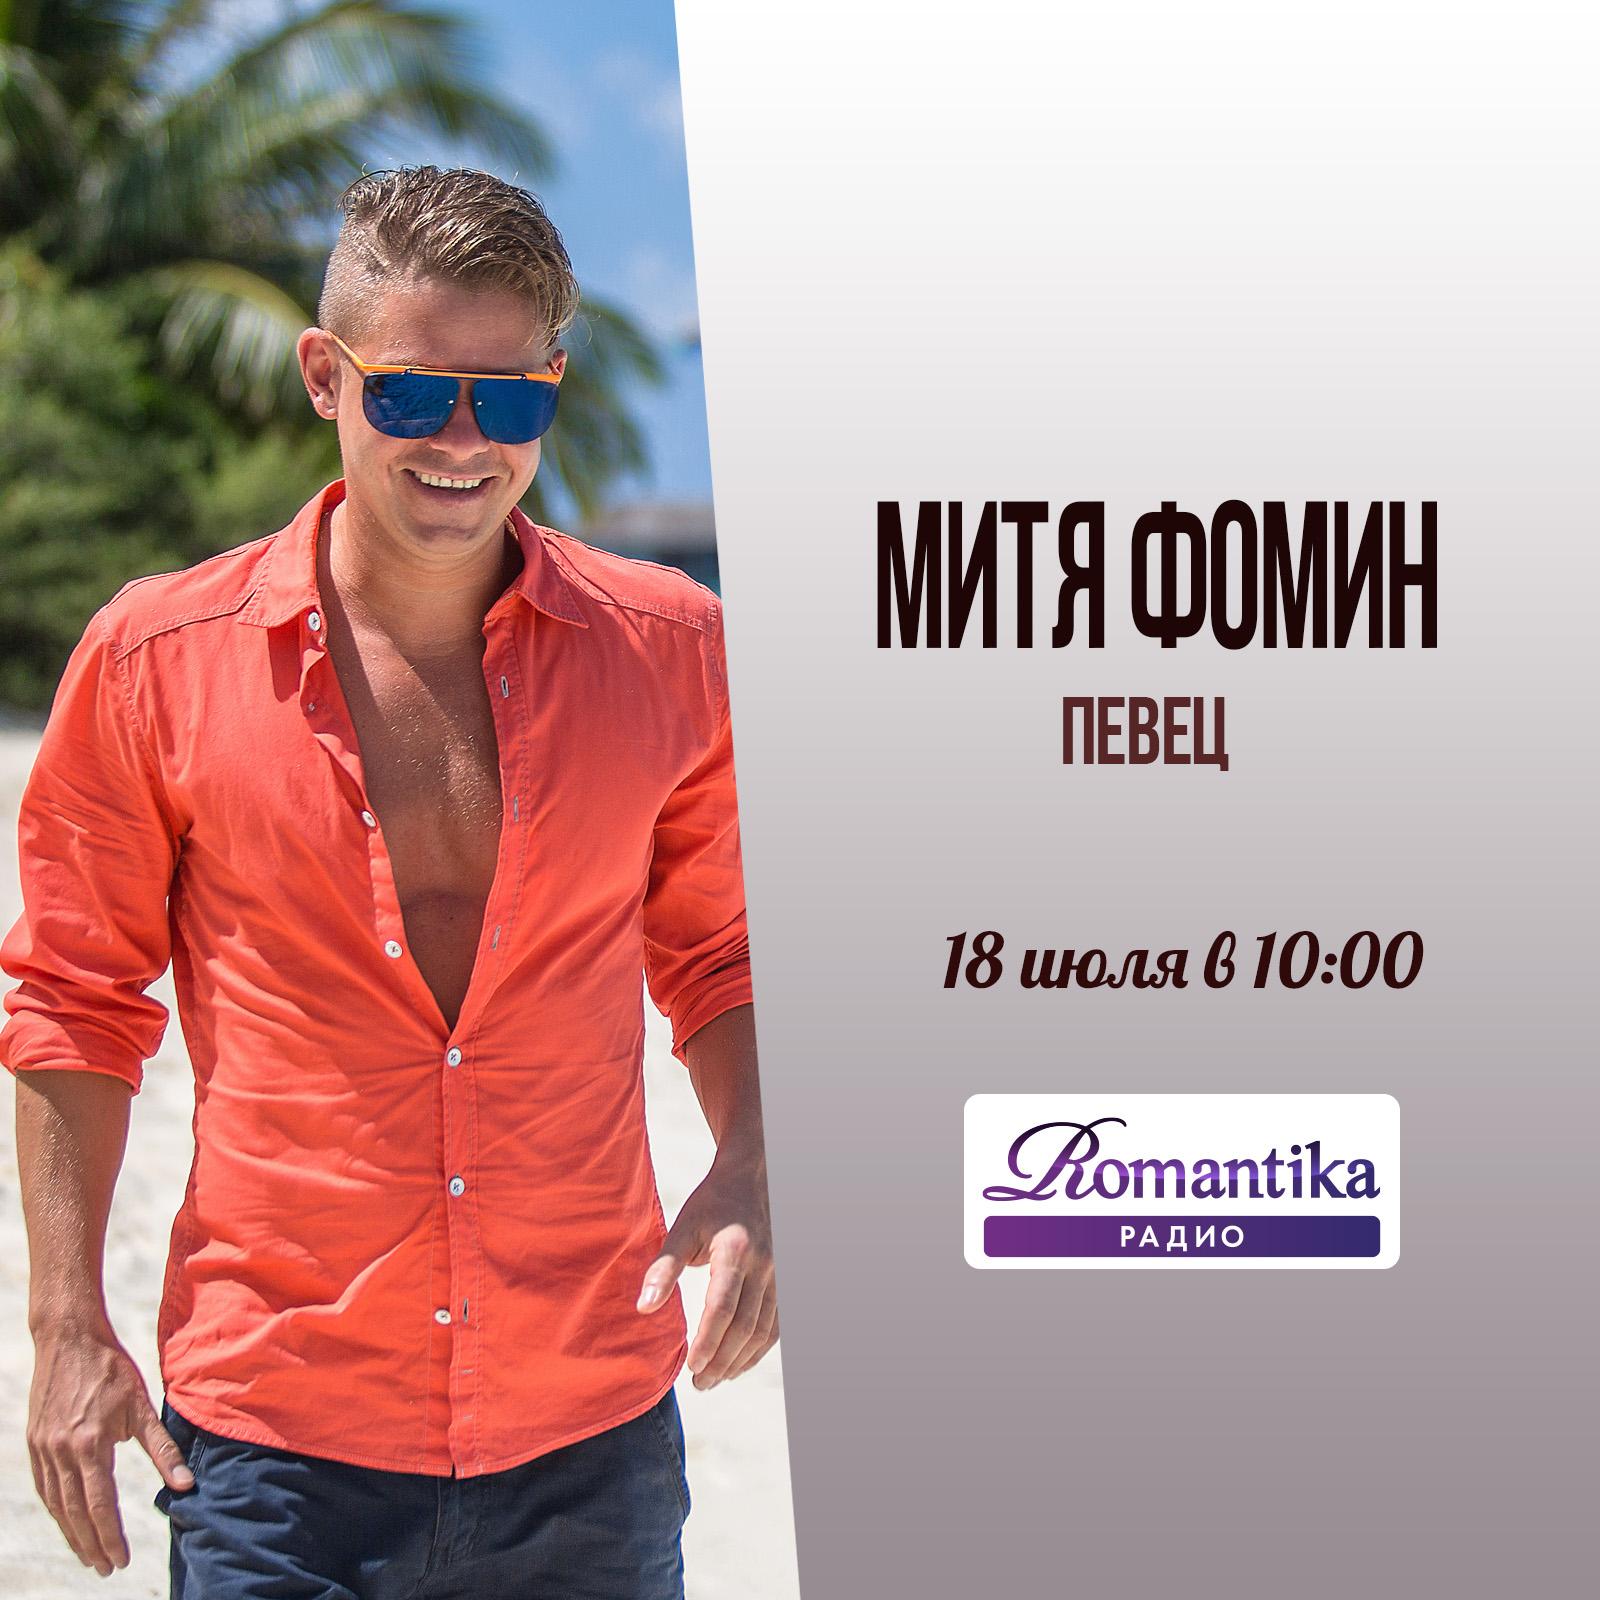 Утро на радио Romantika: 18 июля – в гостях певец Митя Фомин - Радио Romantika